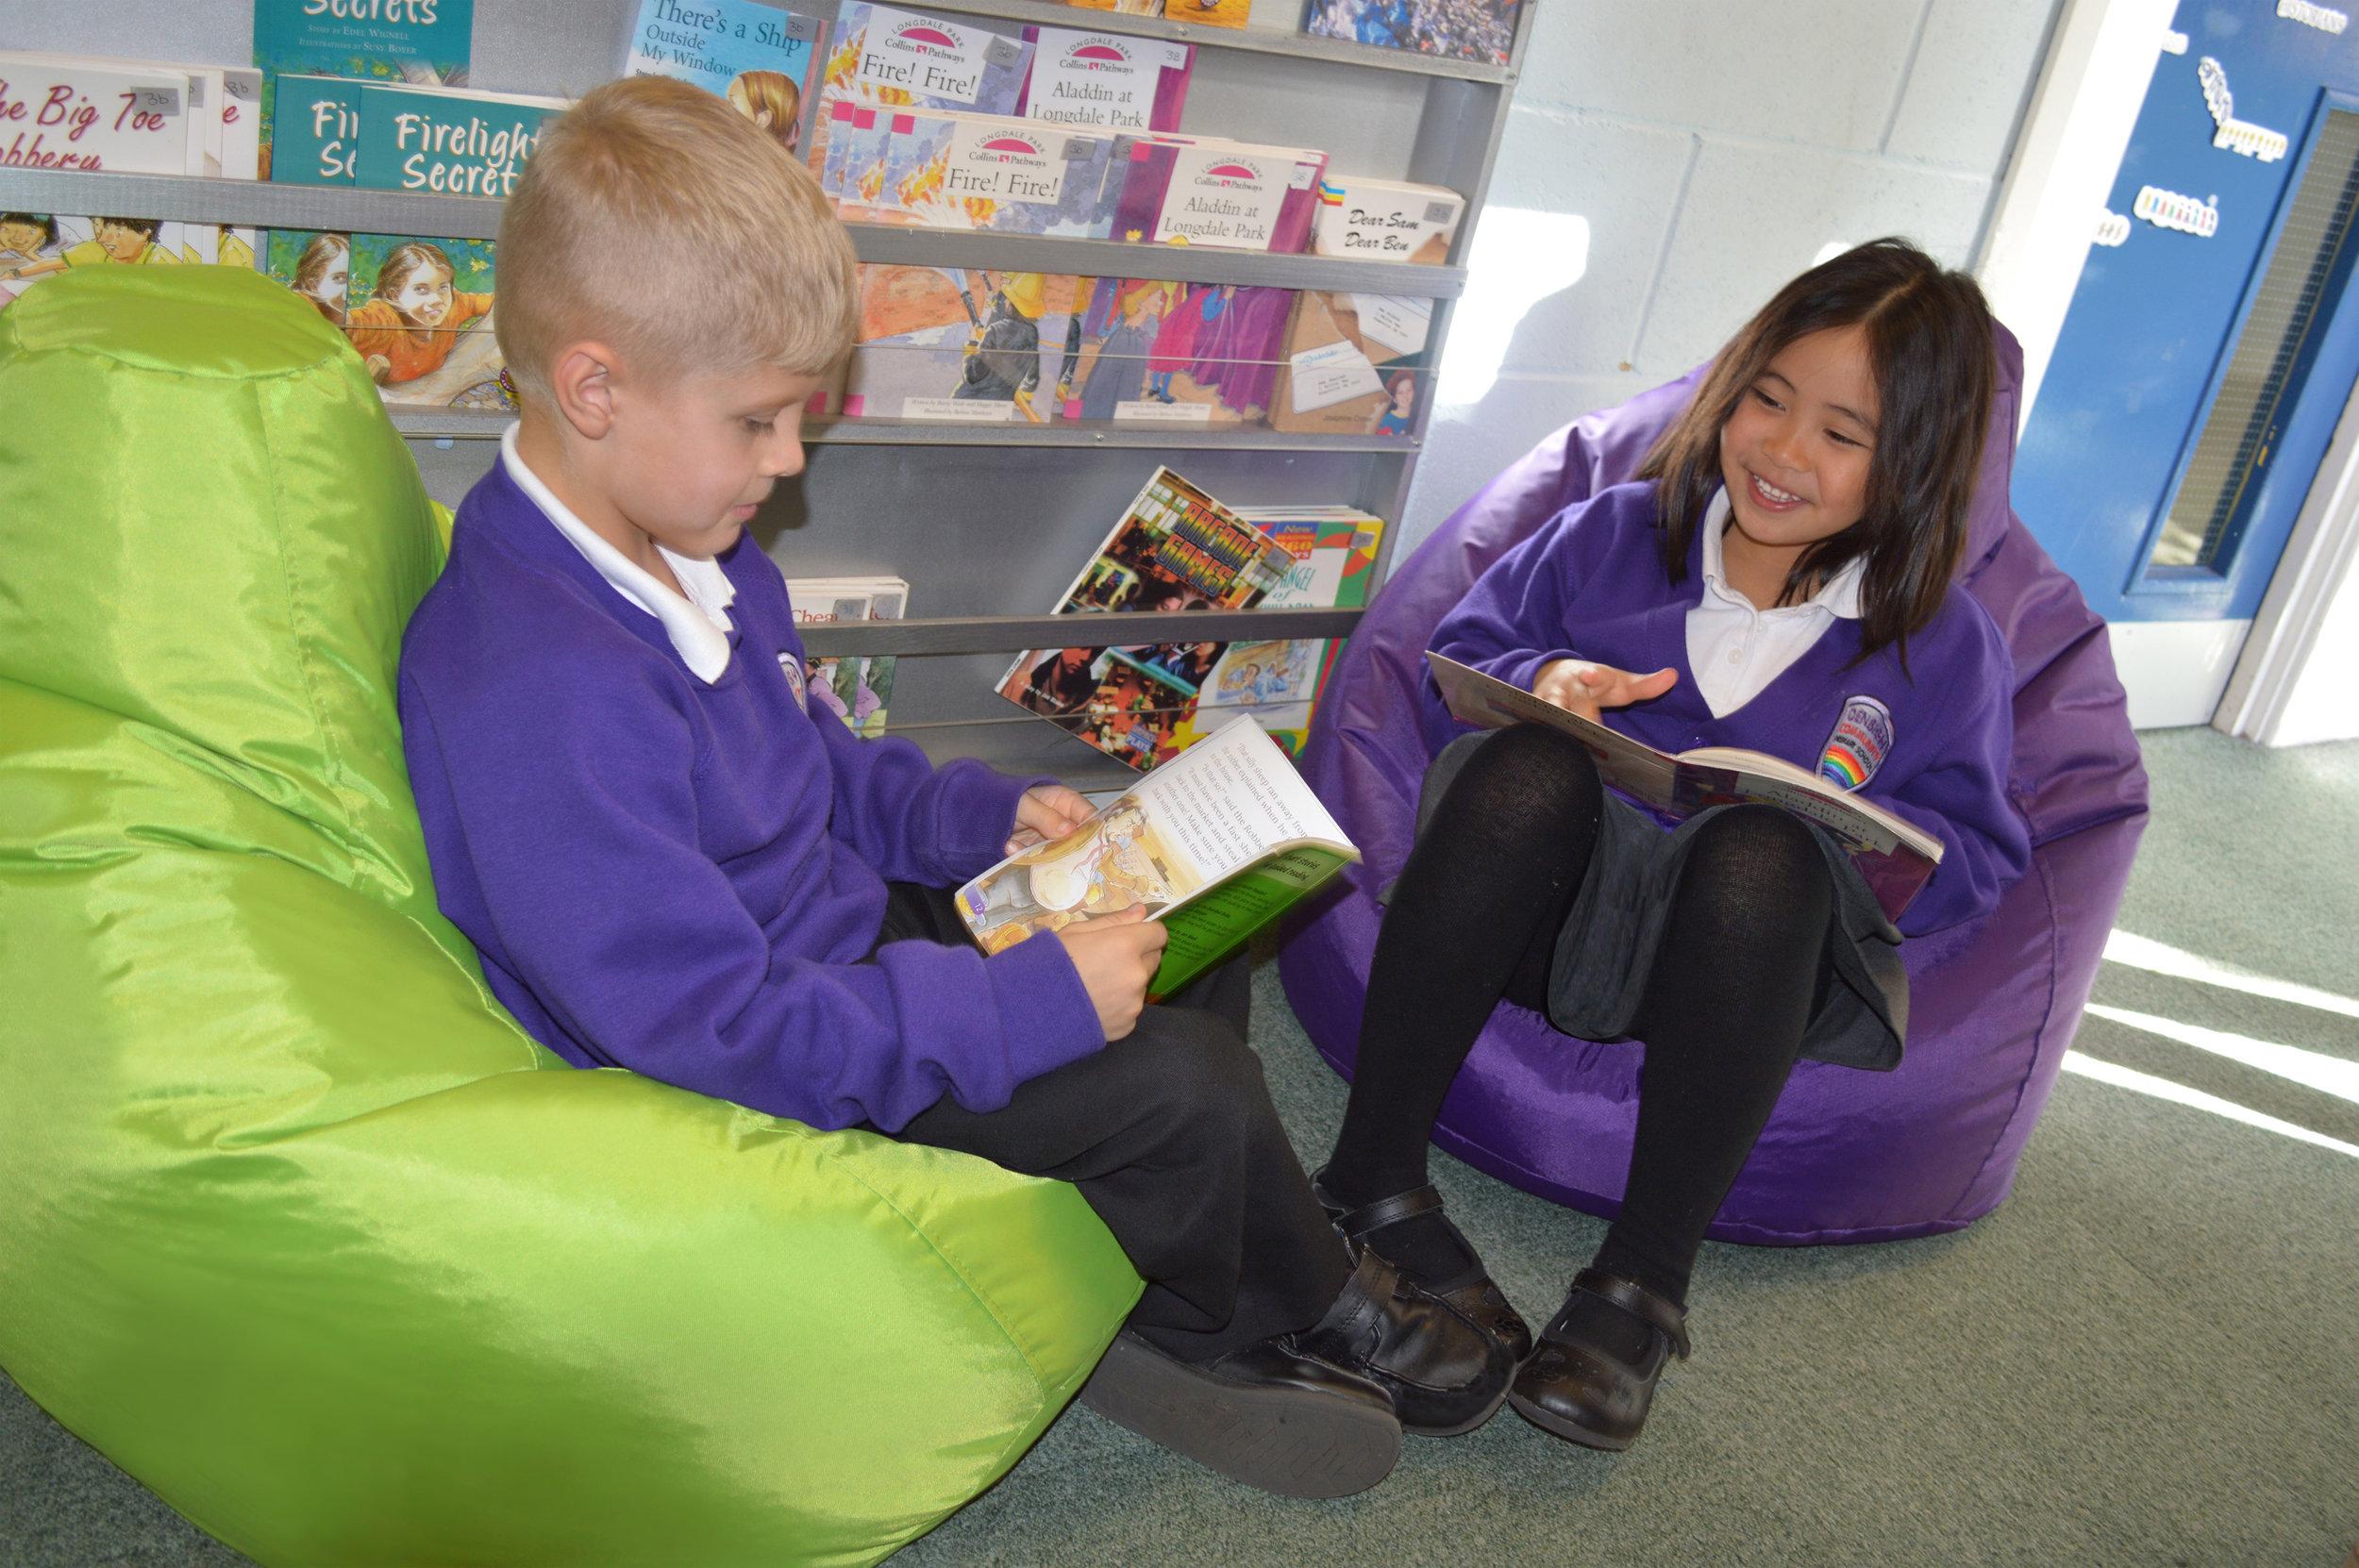 Eden-Kids-Reading-Pod-LF-300dpi-4.jpg